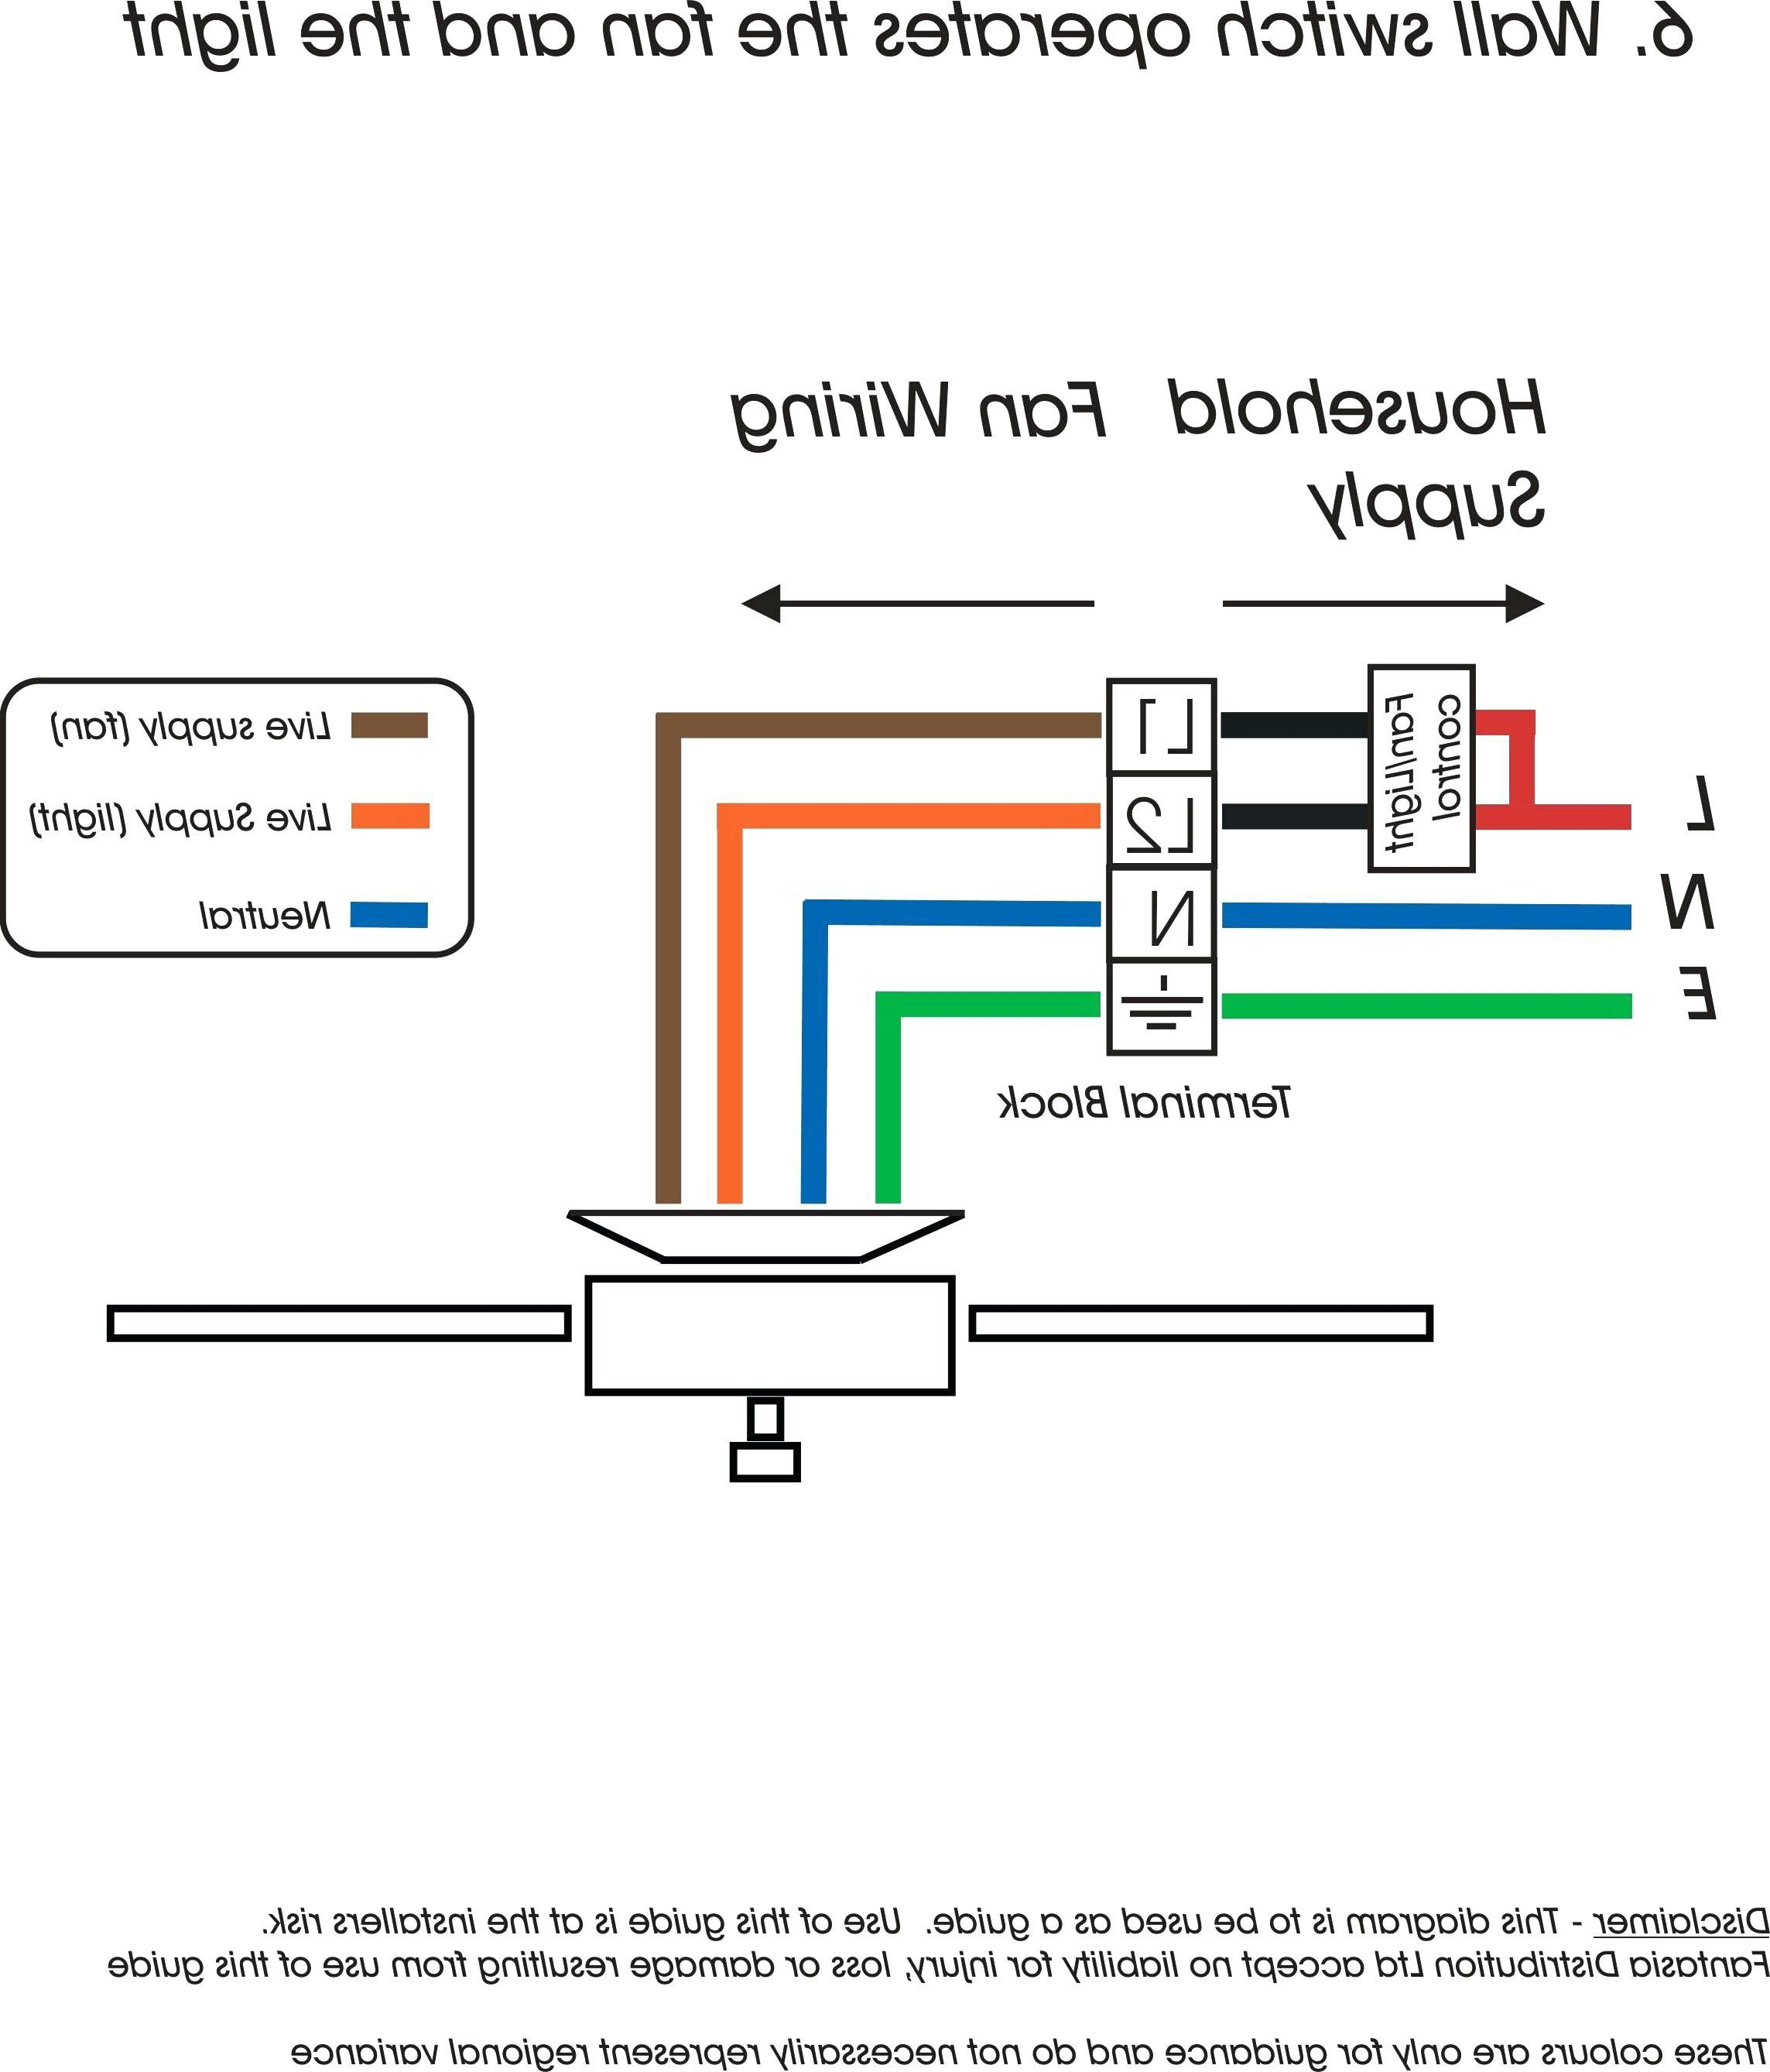 Leviton Dimmers Wiring Diagram Unique Dimmer Switch Wiring Diagram Diagram Of Leviton Dimmers Wiring Diagram